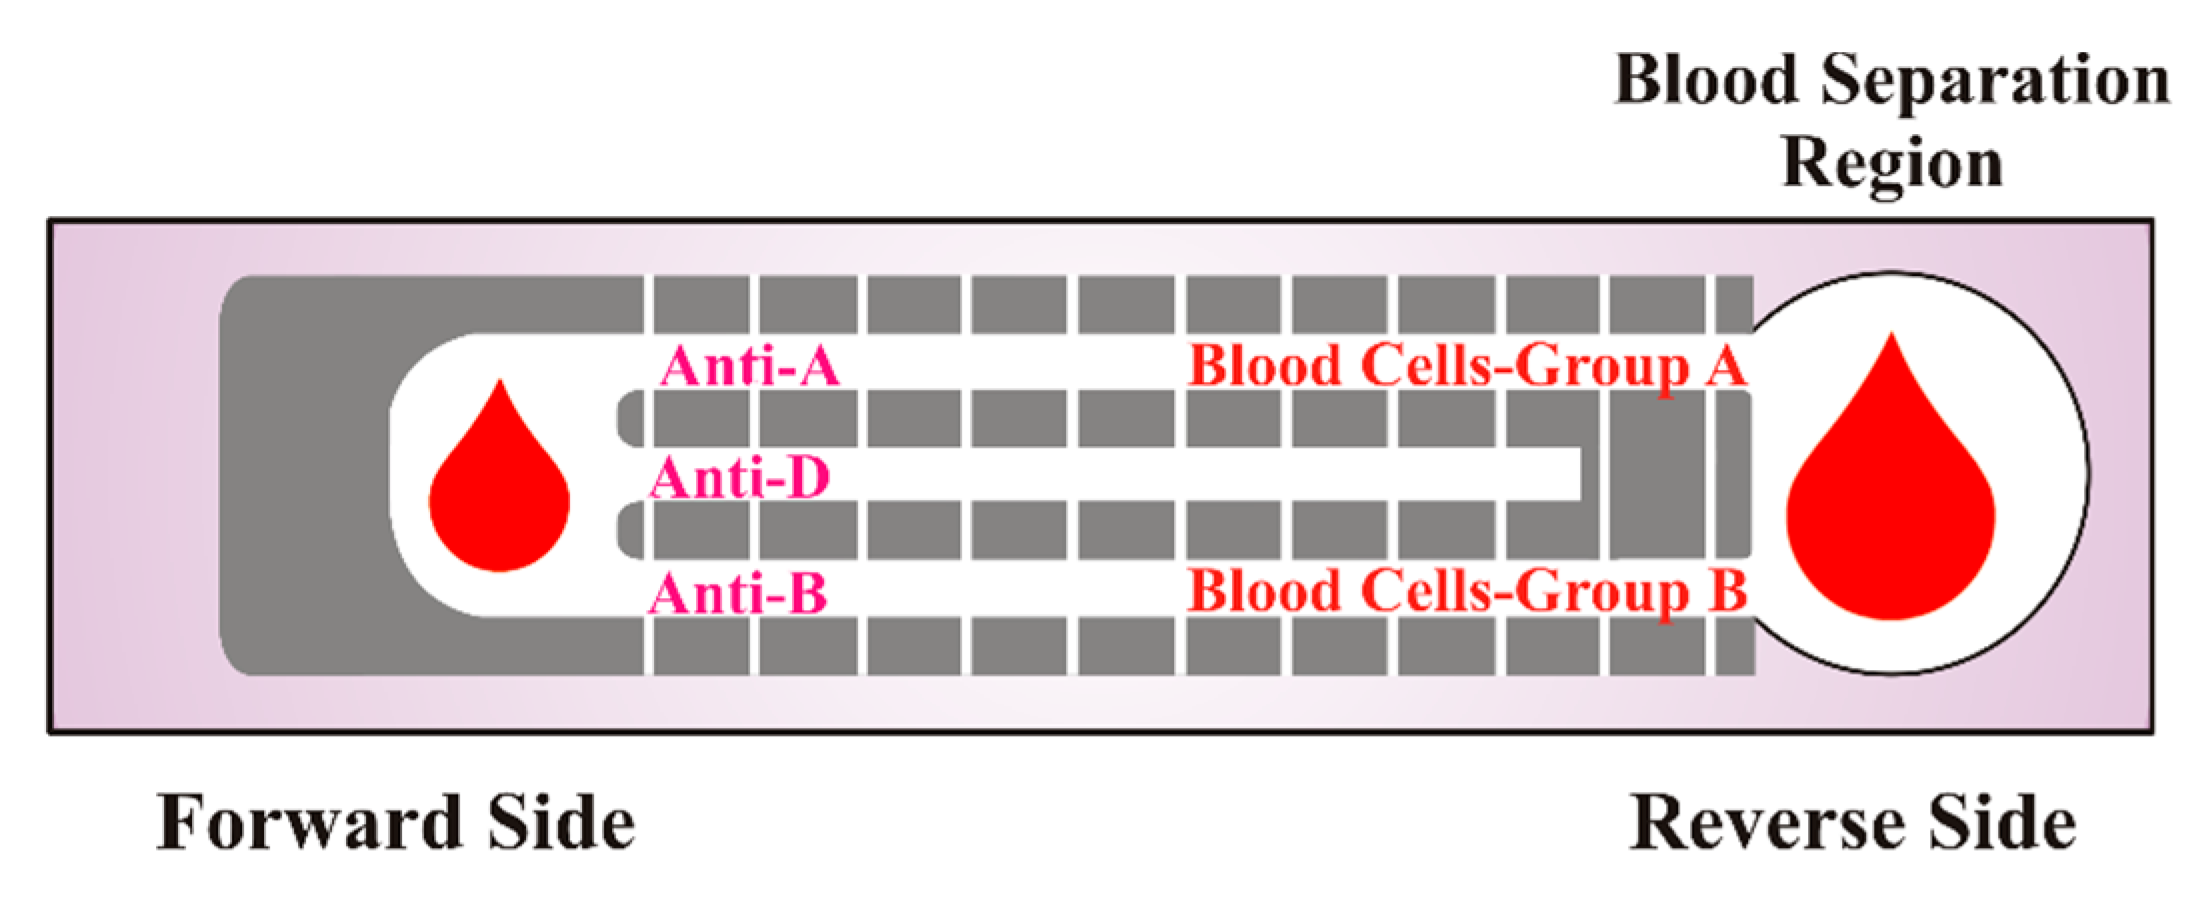 reverse blood typing procedure